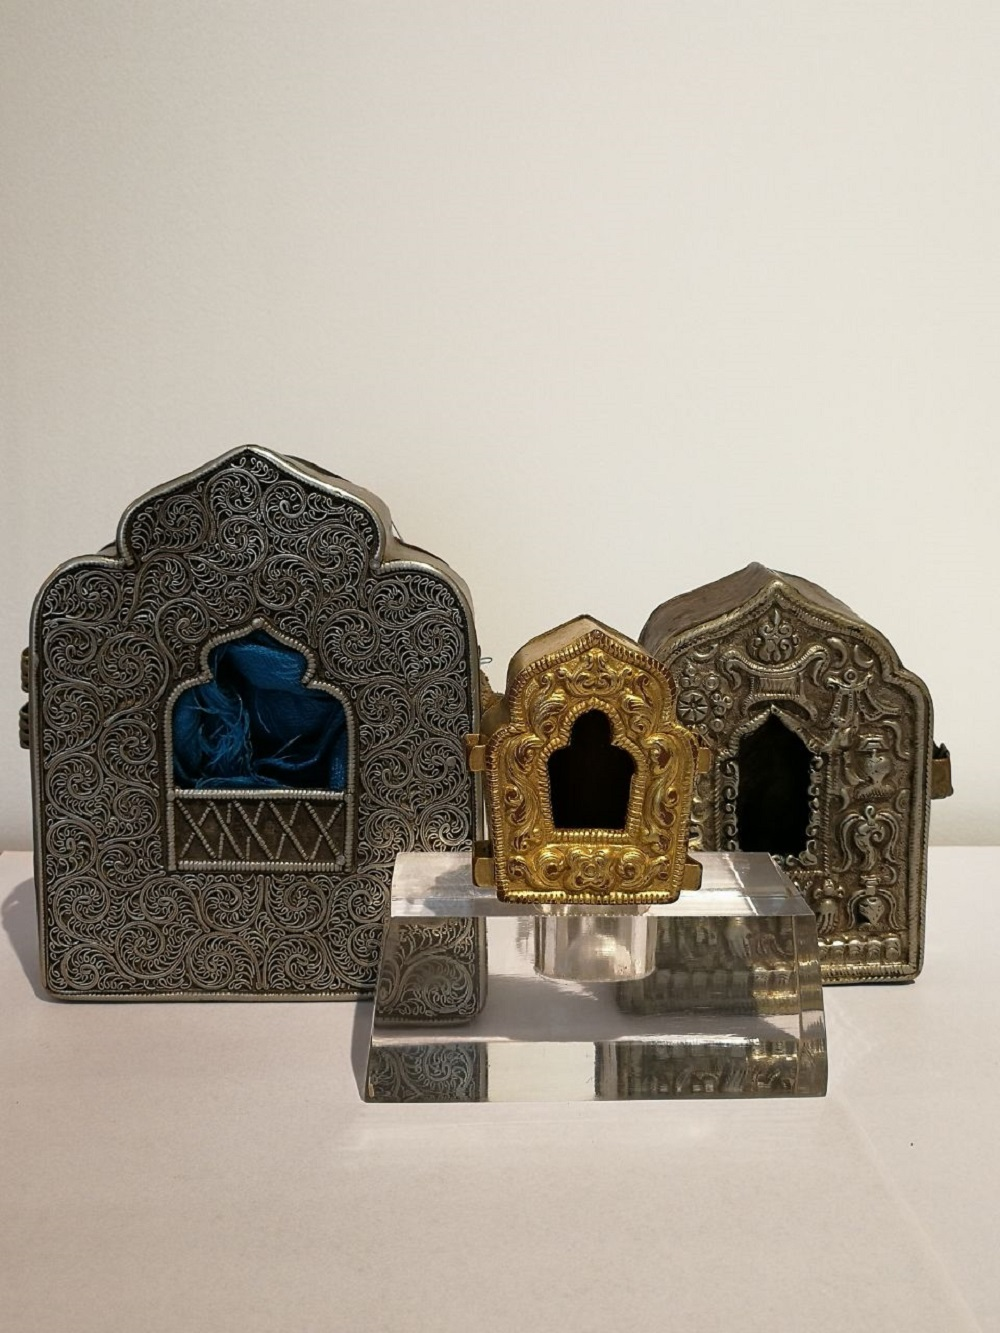 3 pcs of Gawu boxes (Qing Dynasty)